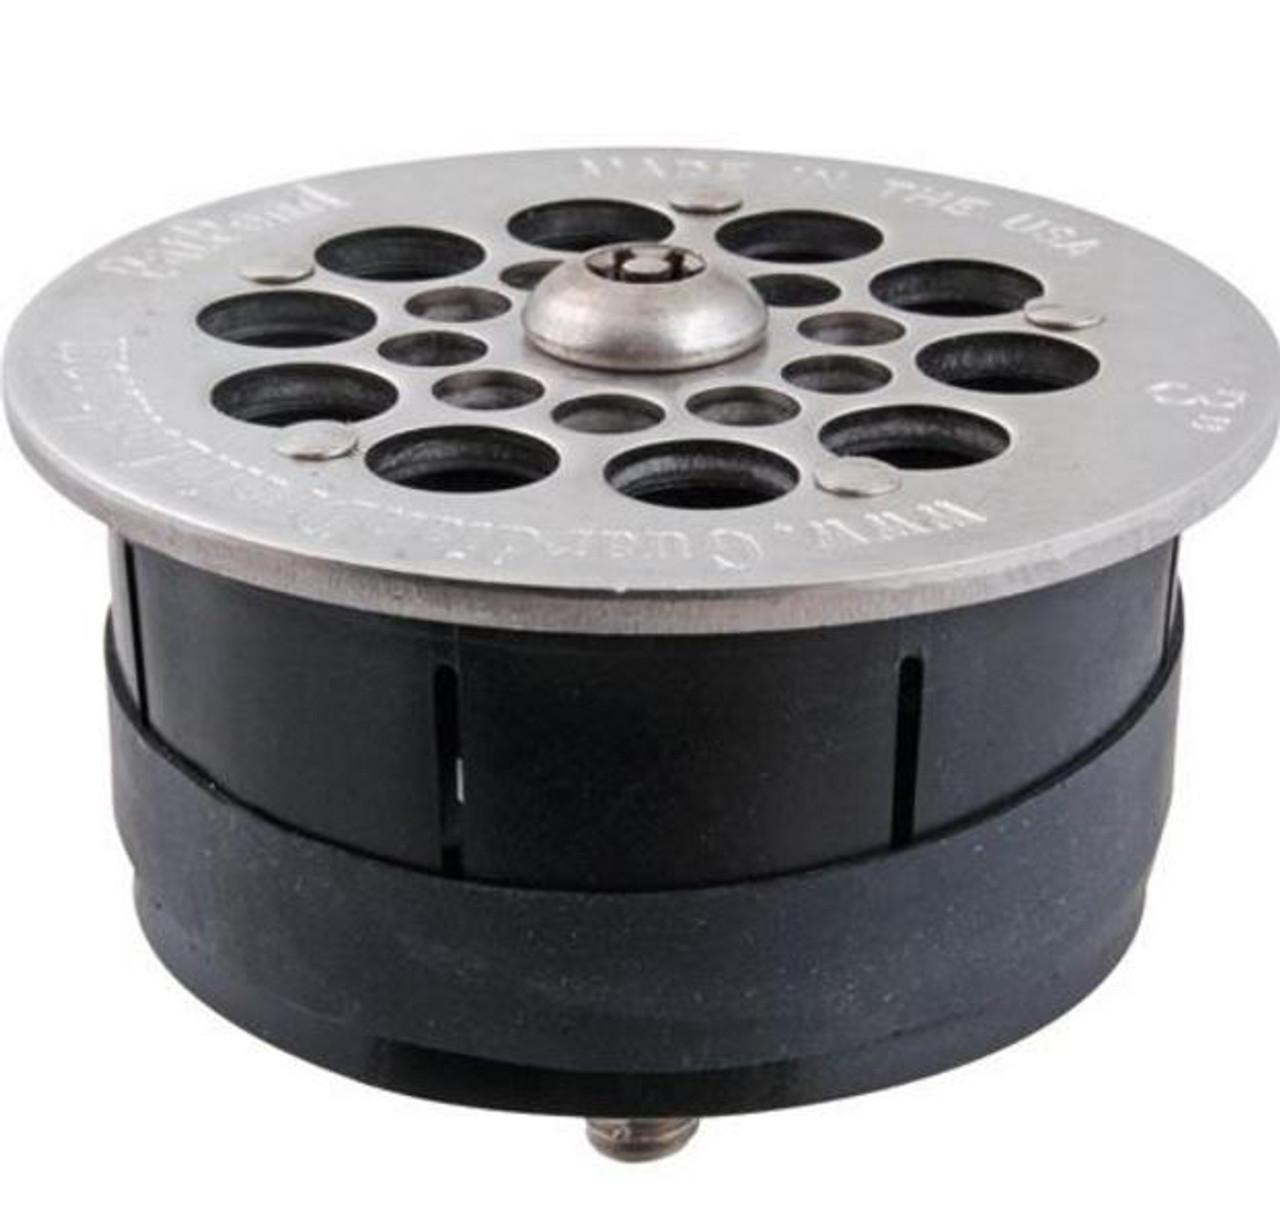 Guardian Drain Lock 3 inch (for floor sink drains)